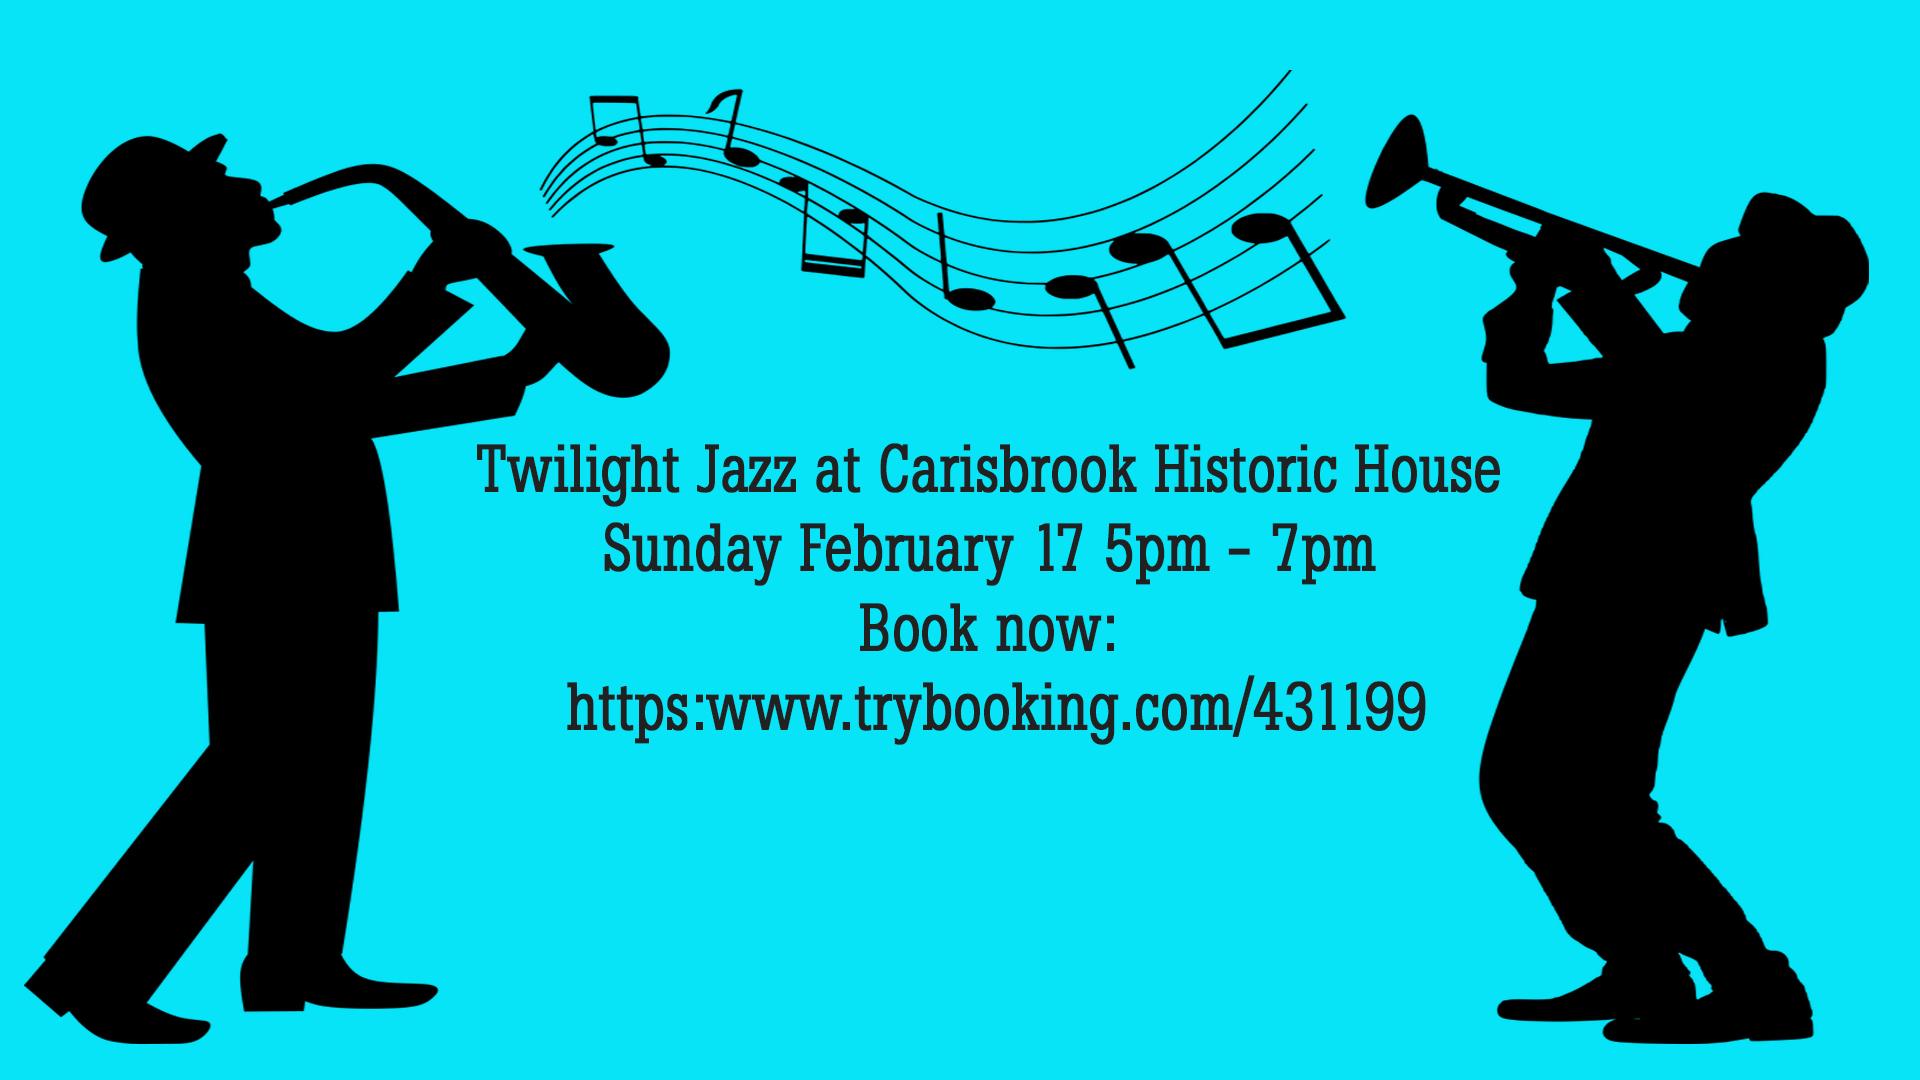 2018 Feb 17 Twilight Jazz at Carisbrook_edited-1.jpg